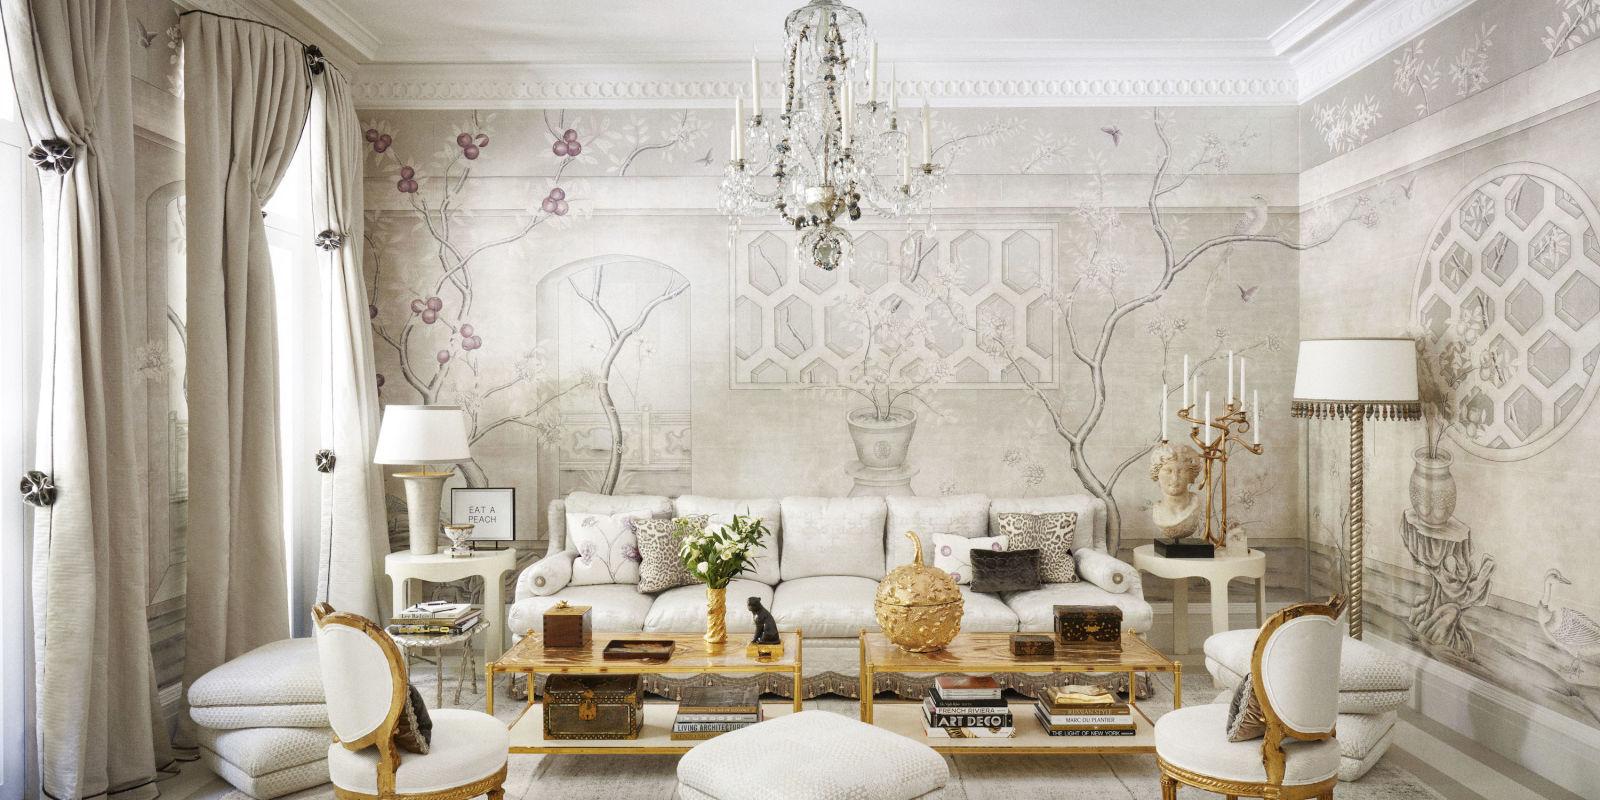 Beautiful Dining Room Ideas: Beautiful Dining Room Design